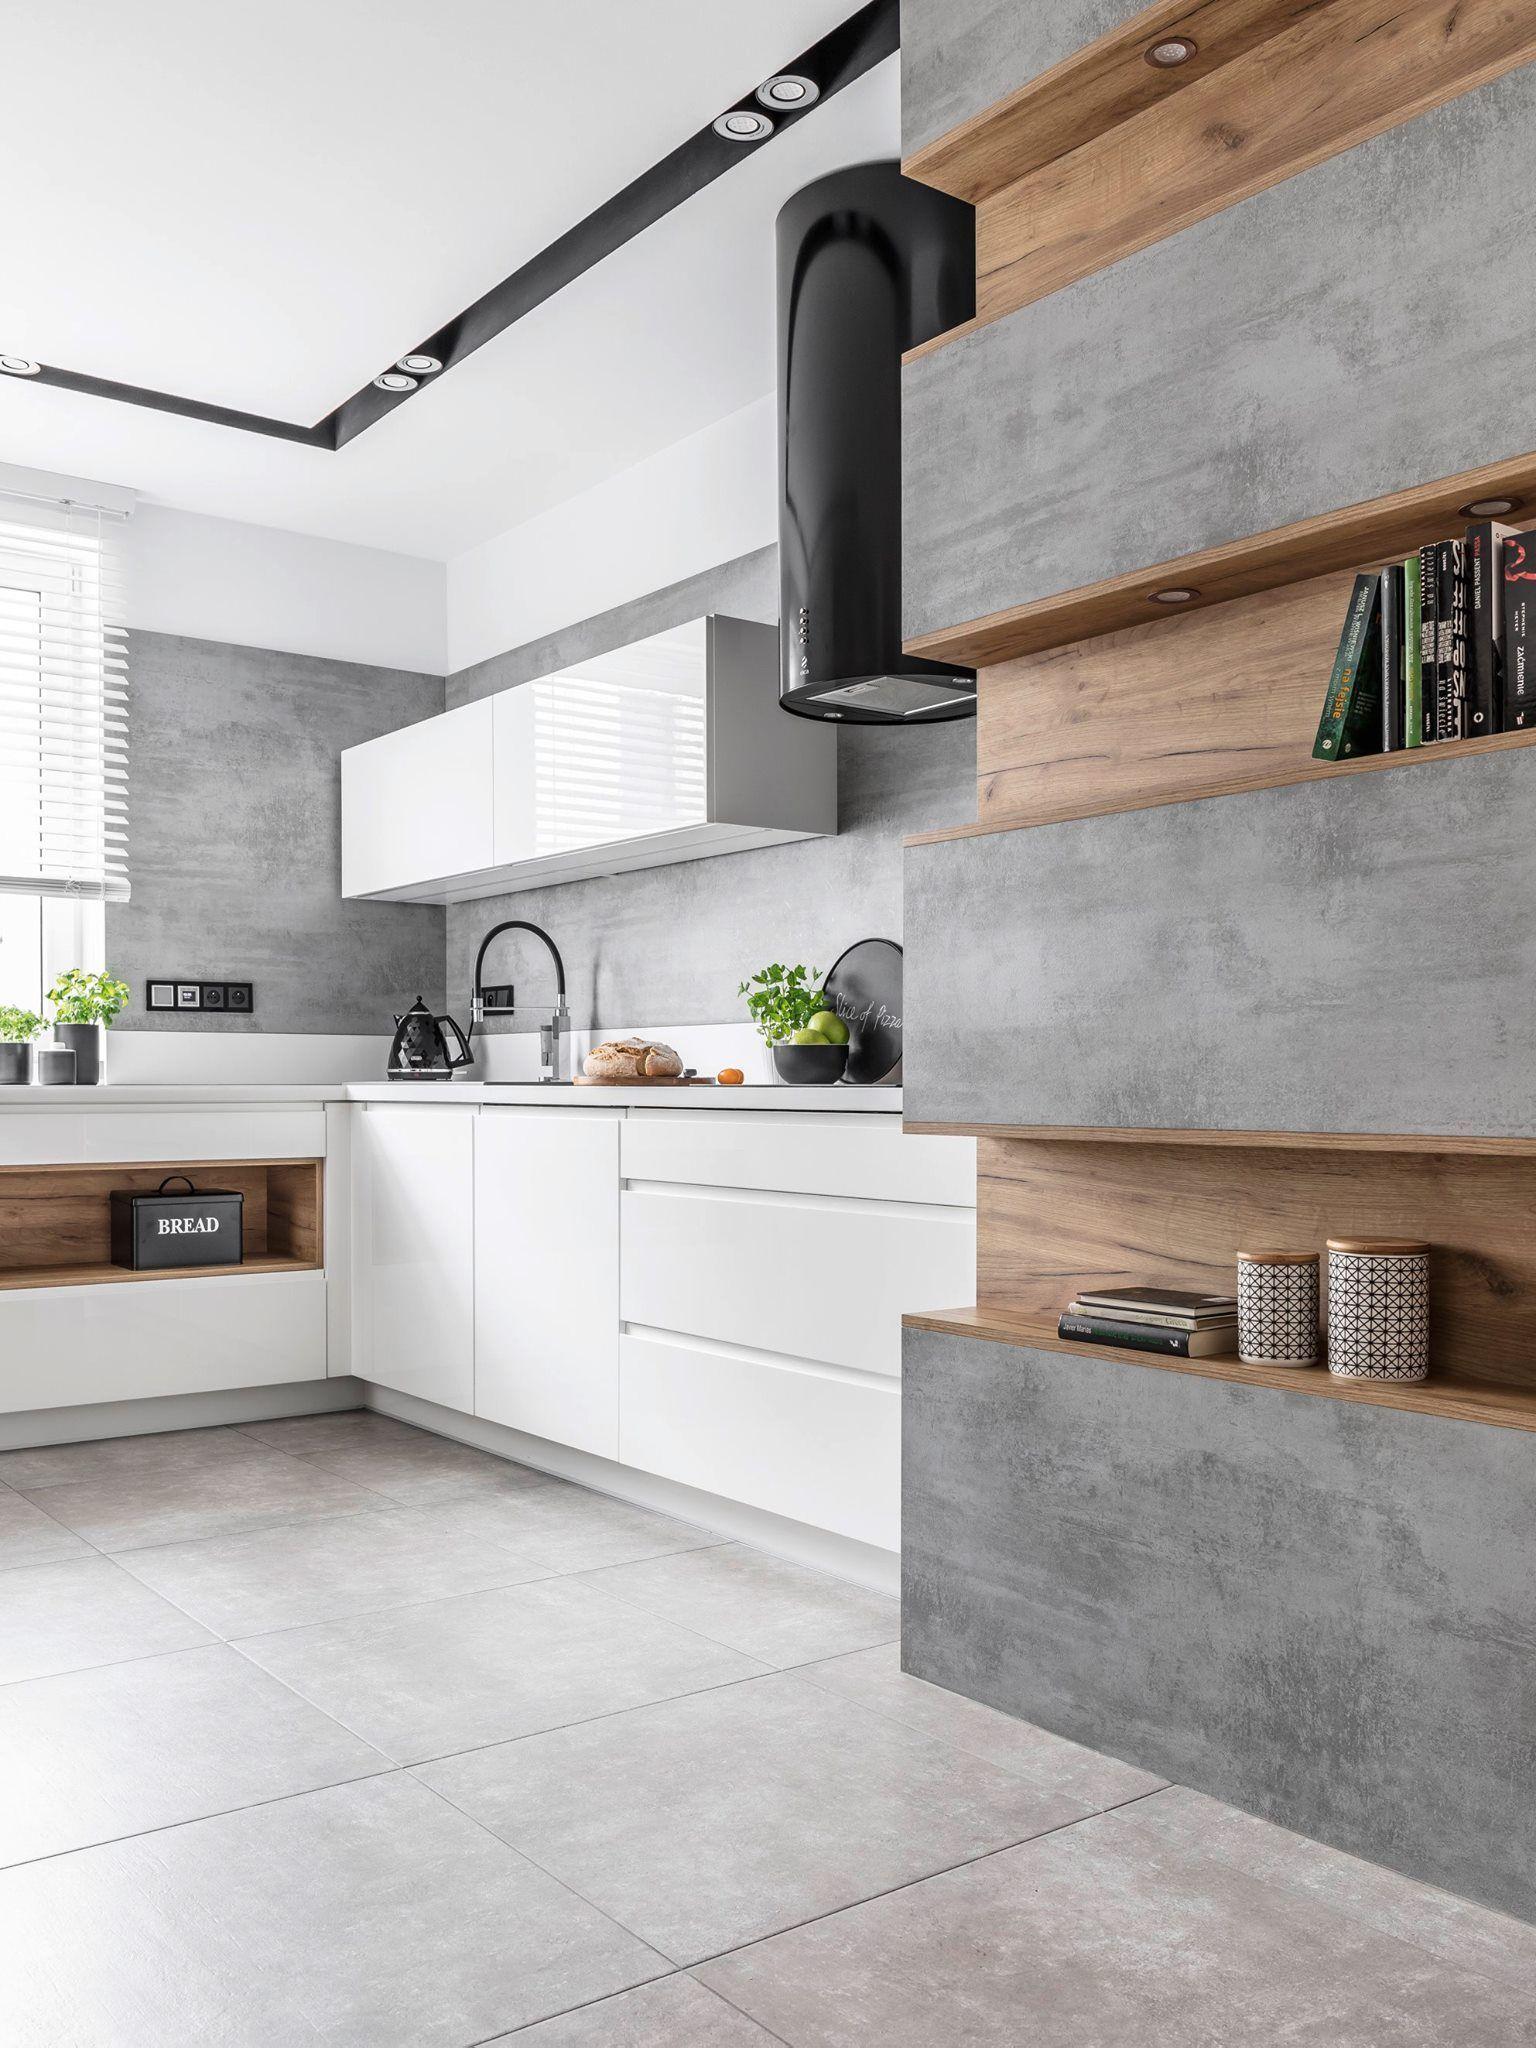 pinterest karenl3a KitchenDecorIdeas2017 Modern Kitchen Design